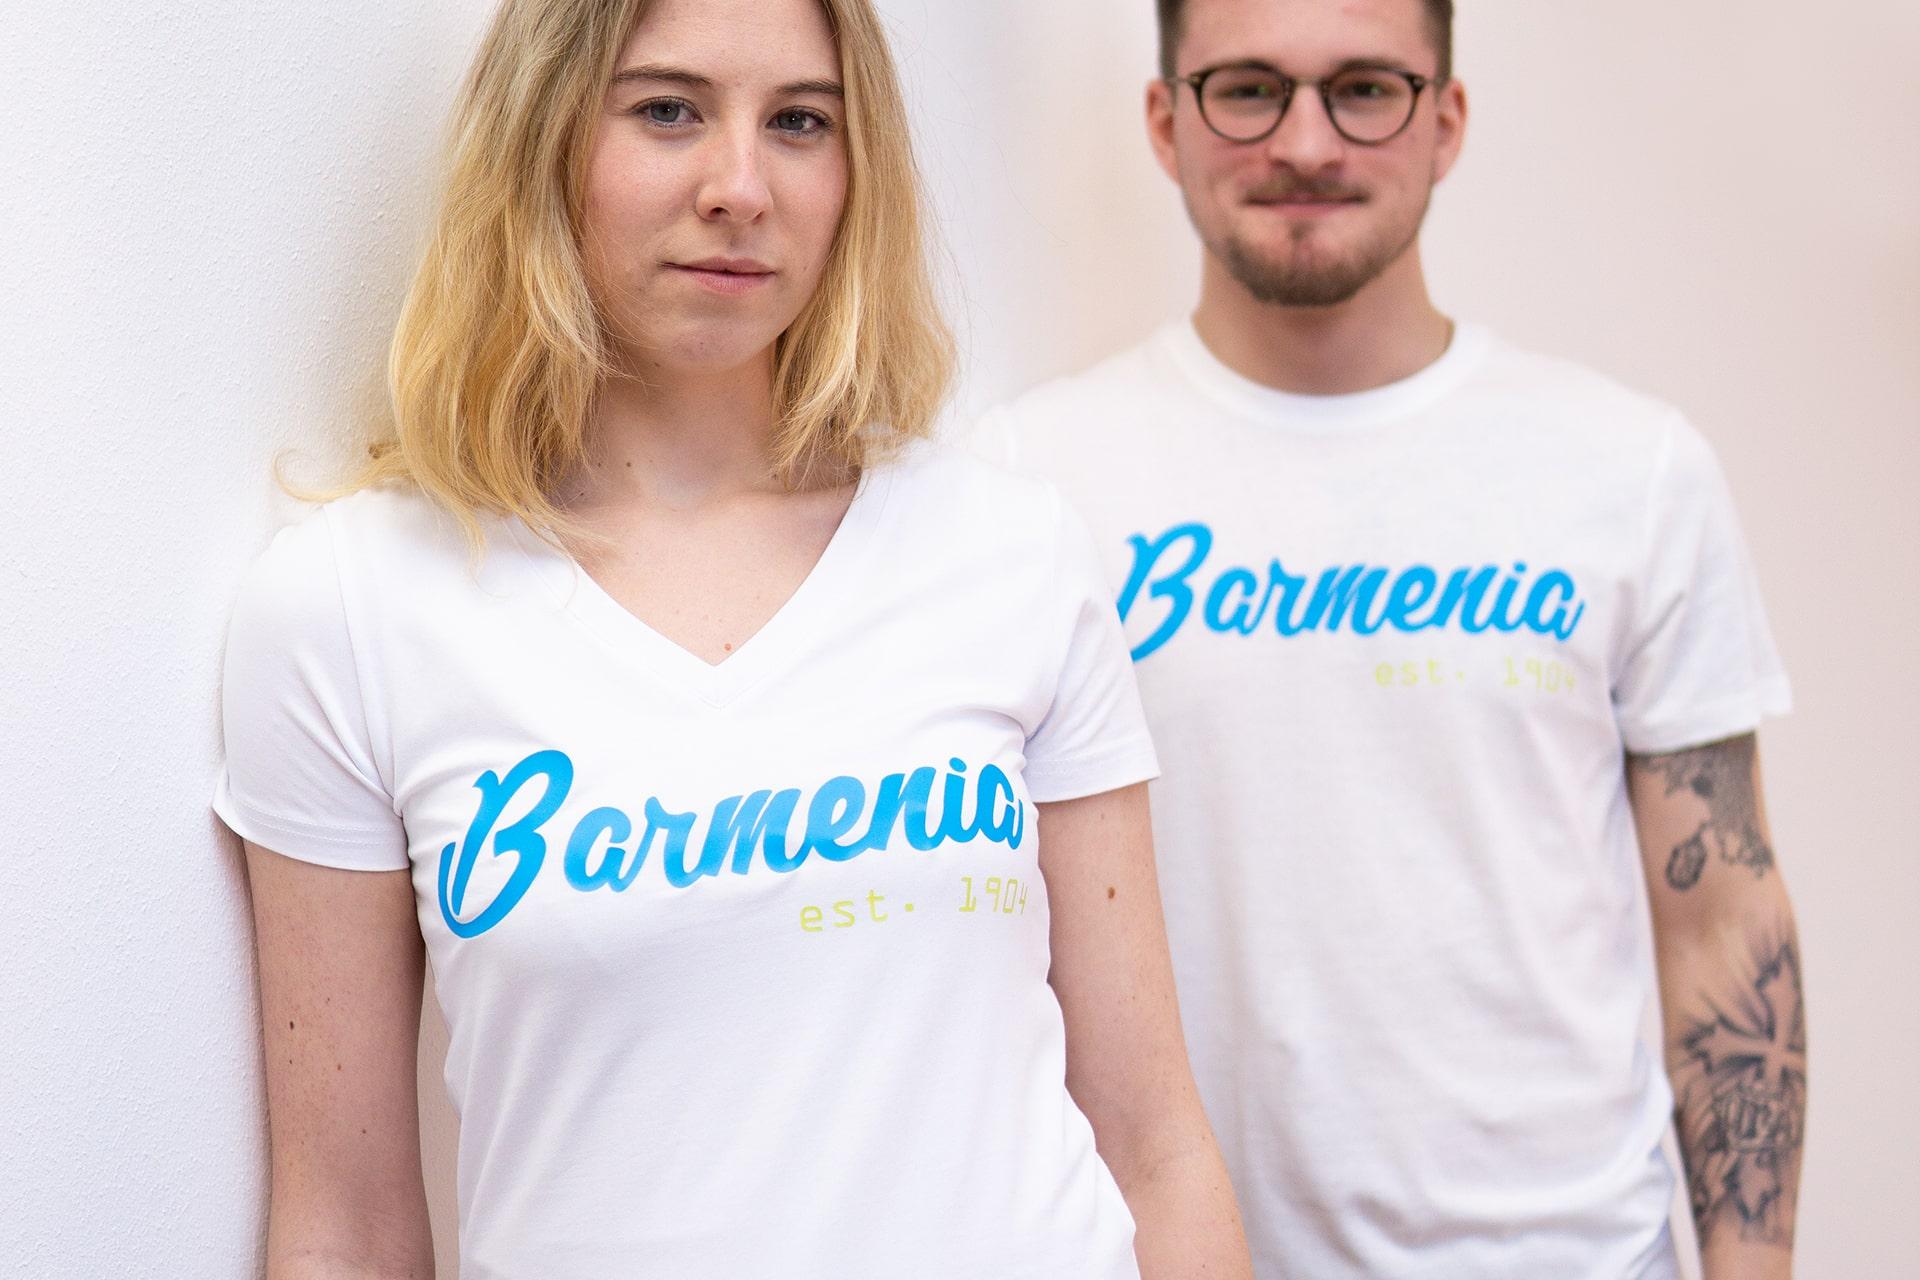 Barmenia T-Shirts